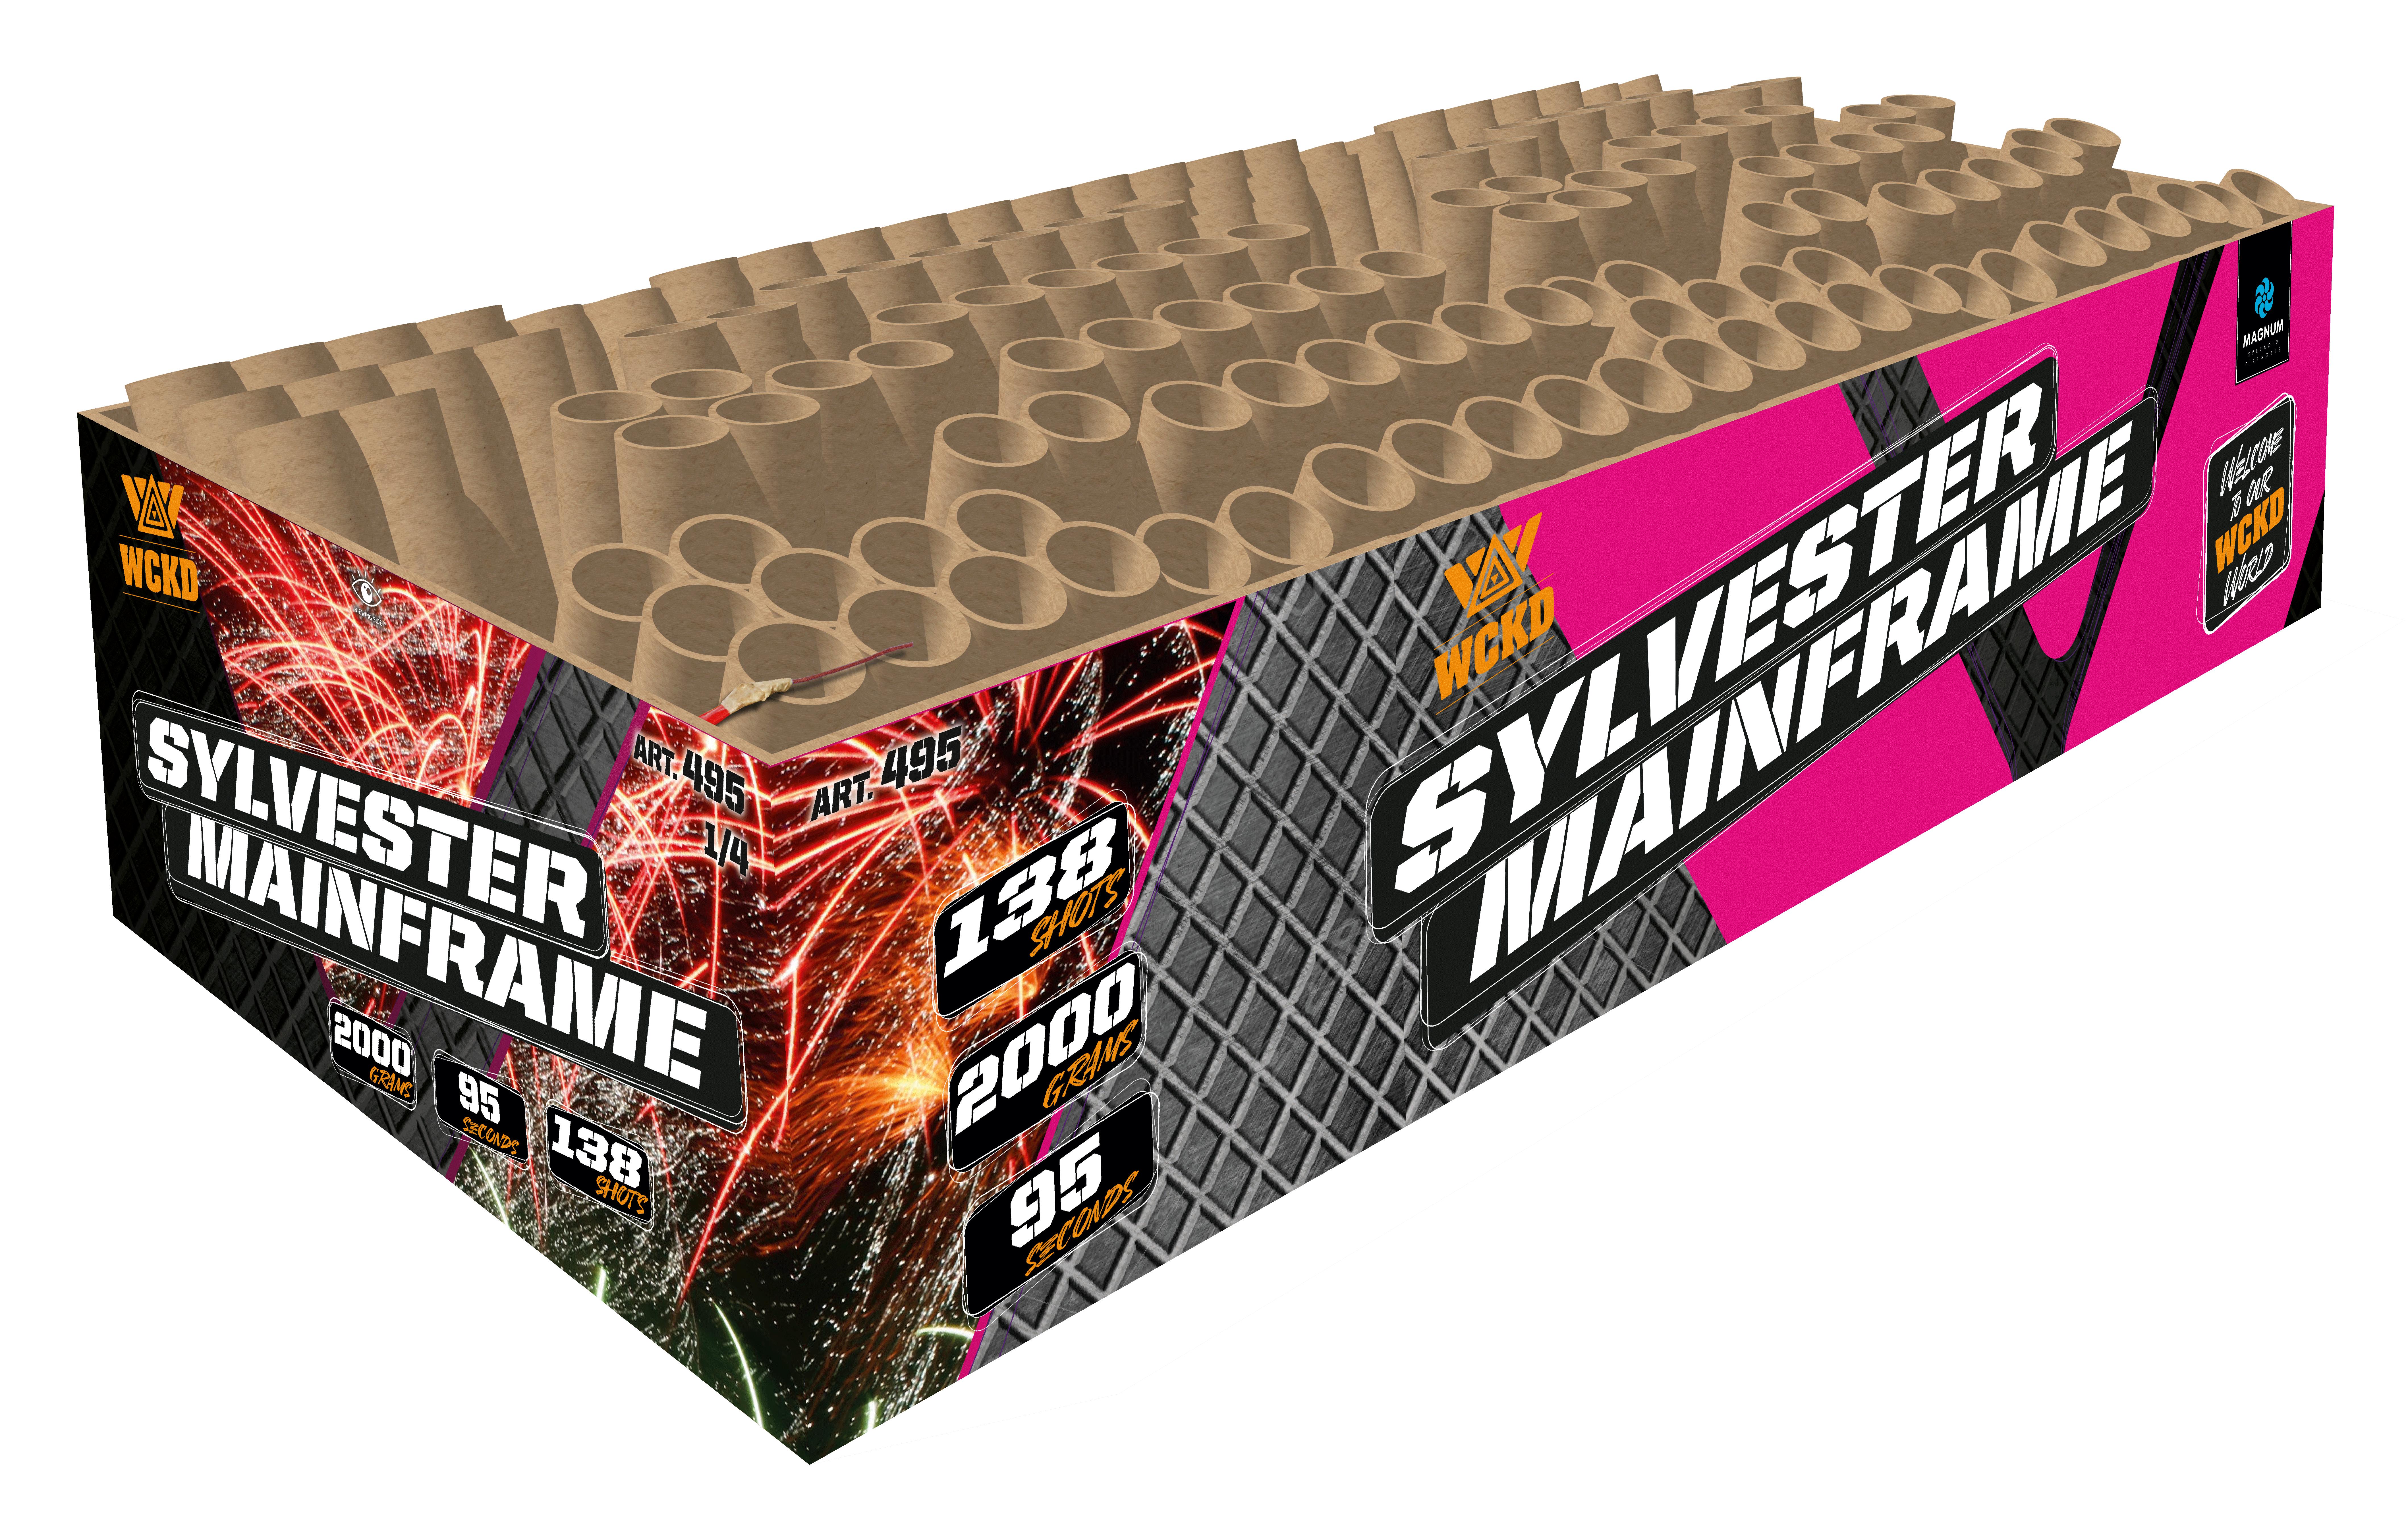 Magnum Sylvester Mainframe 138 Schots Compound